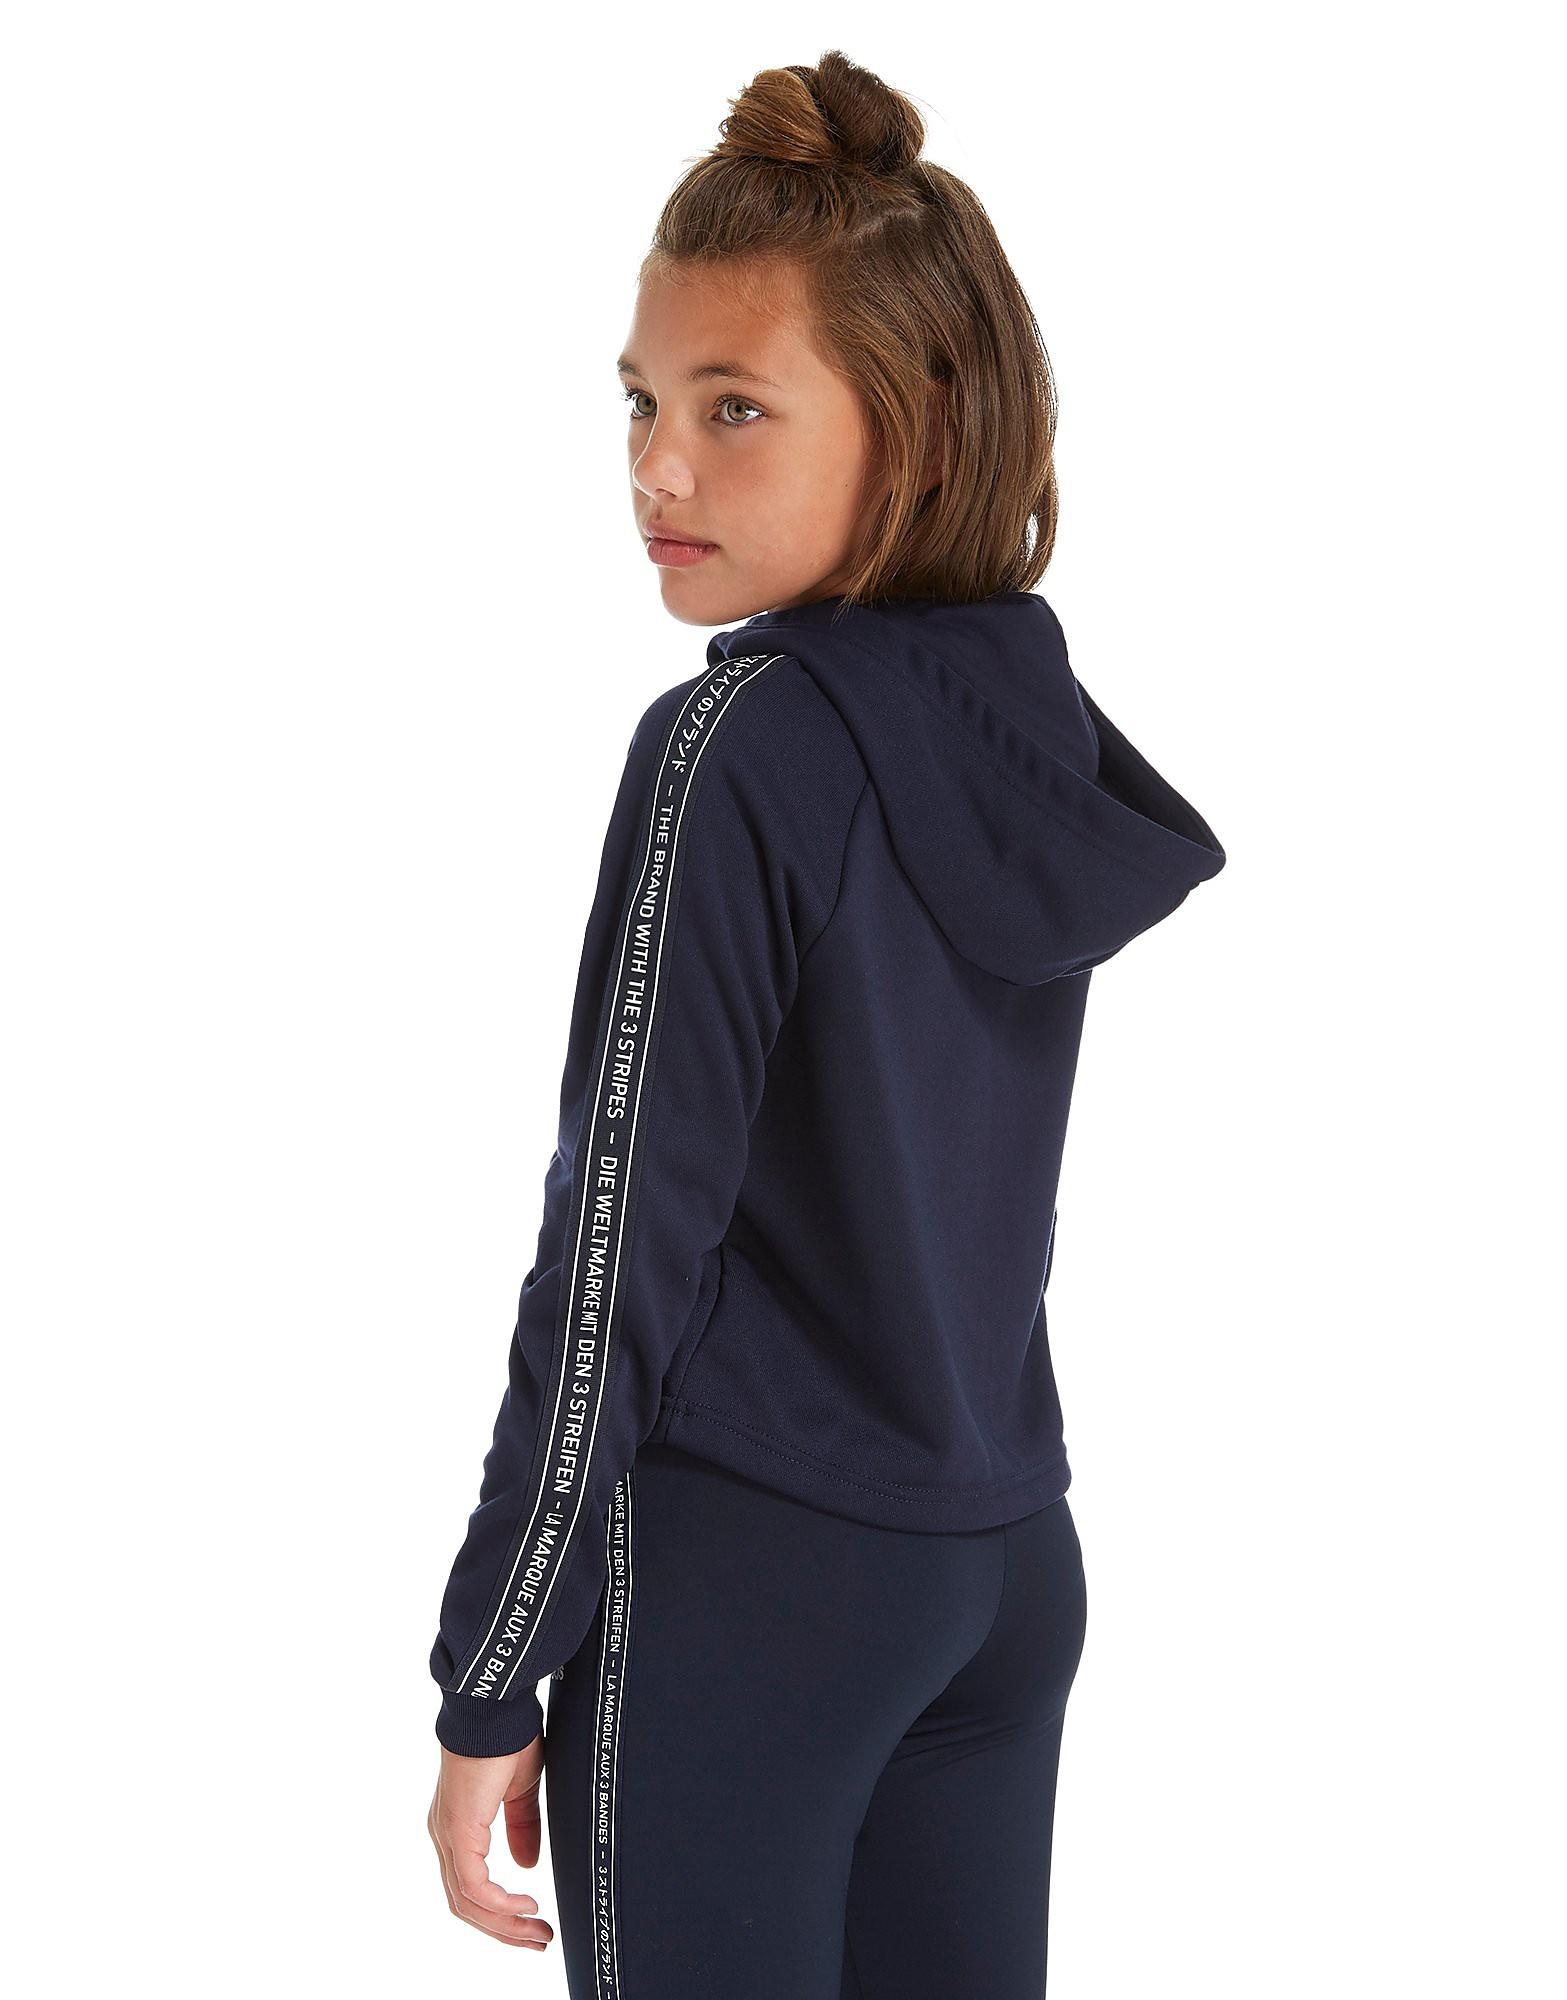 adidas Originals Girls' NMD Cropped Hoodie Junior